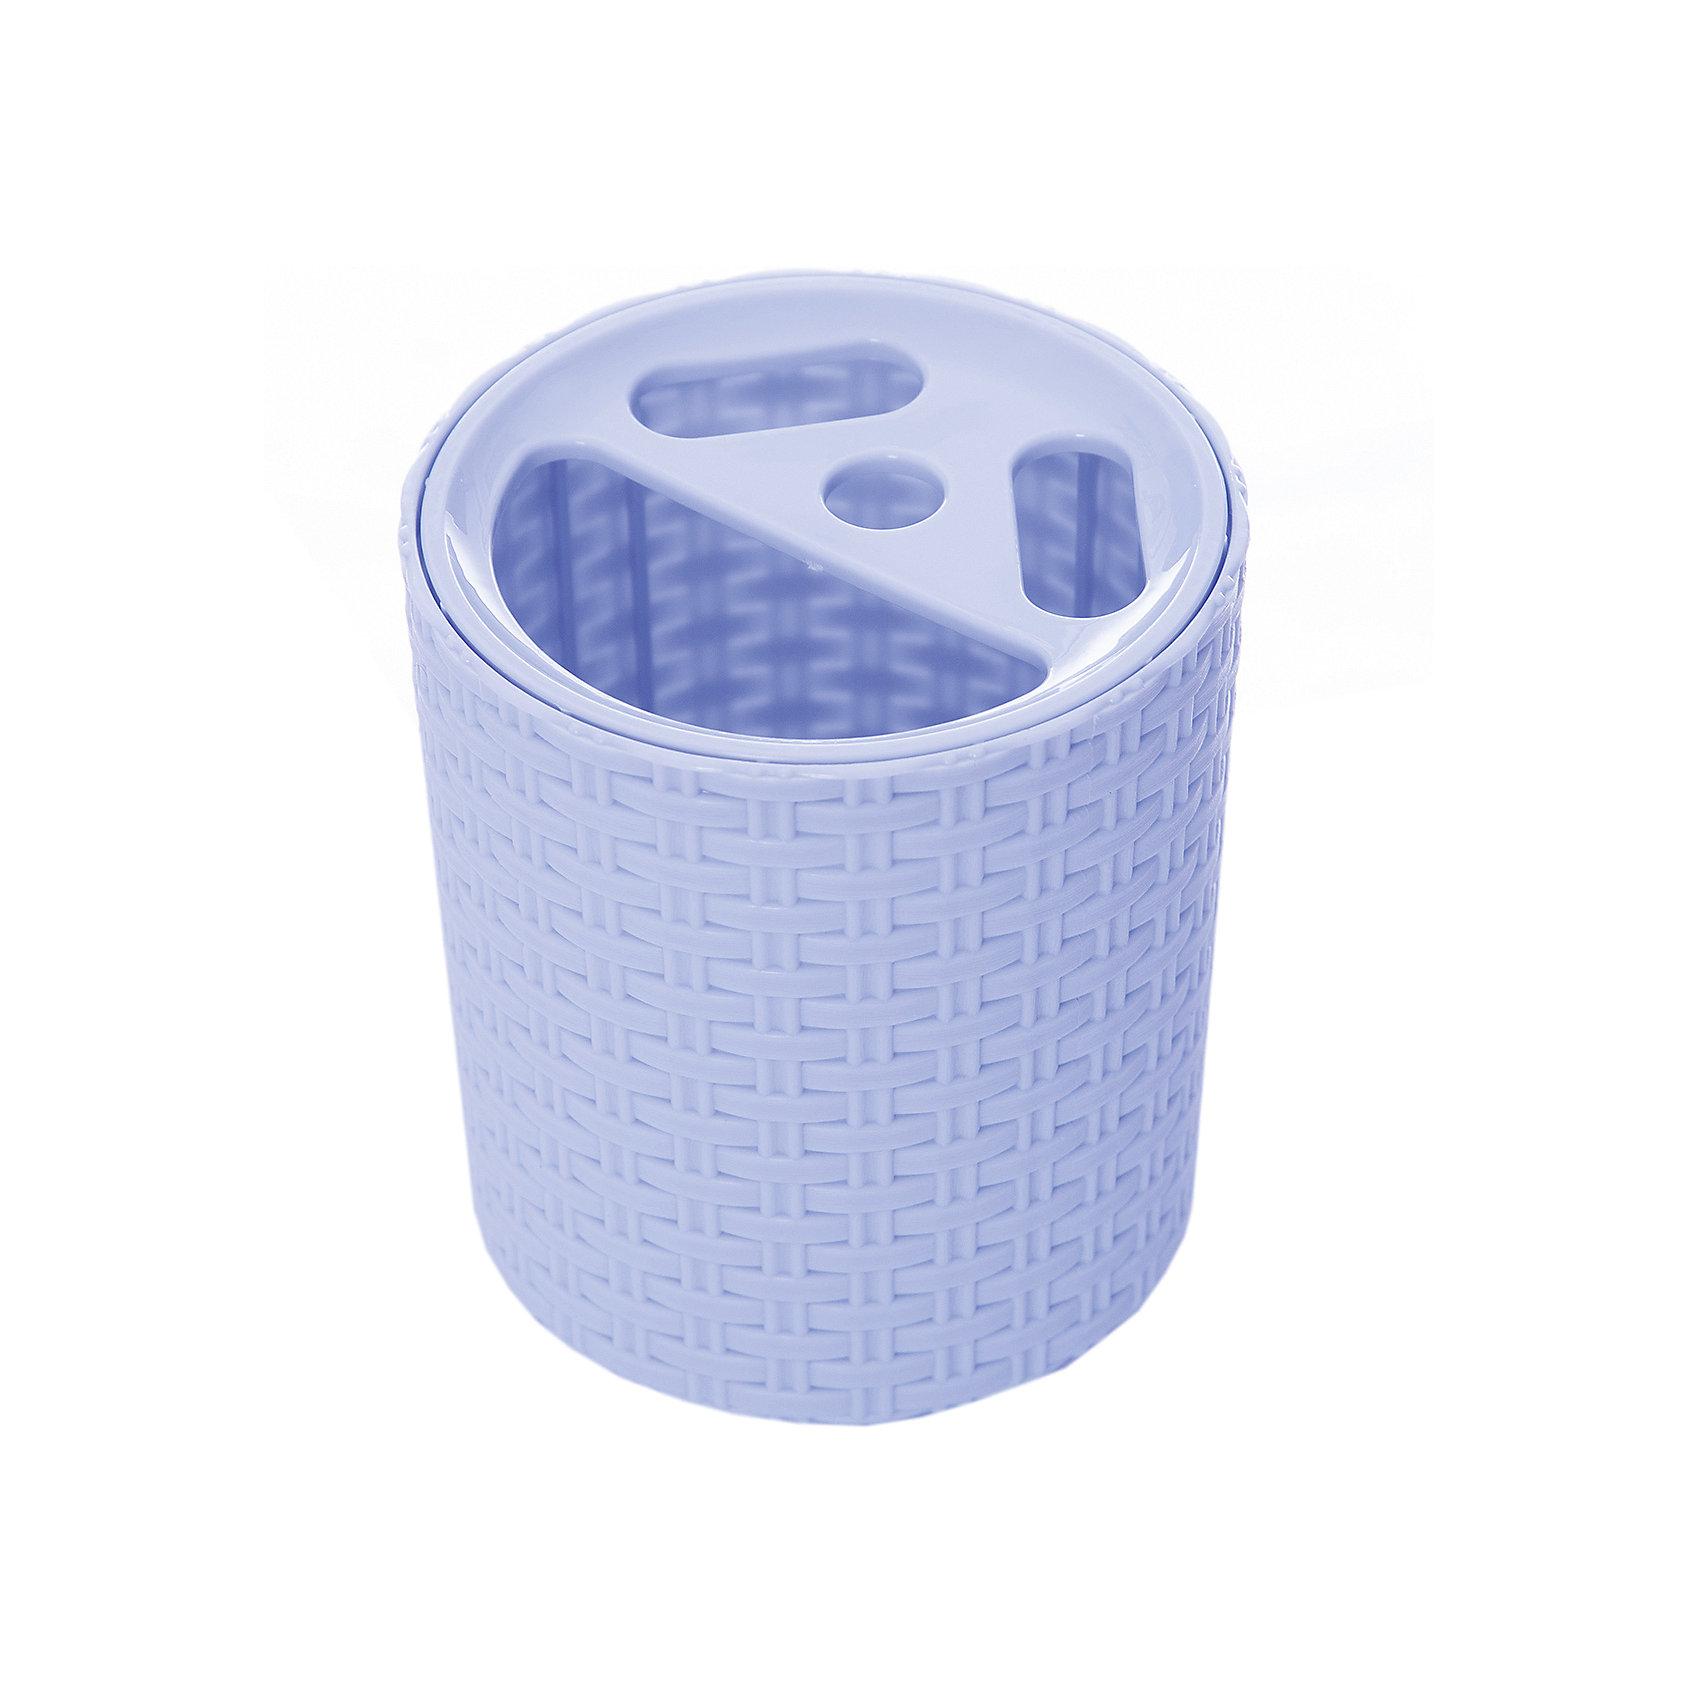 Alternativa Подставка Плетёнка для зубных щёток , Alternativa, голубой стаканчик для зубных щеток wasserkraft wern 7528 9060516